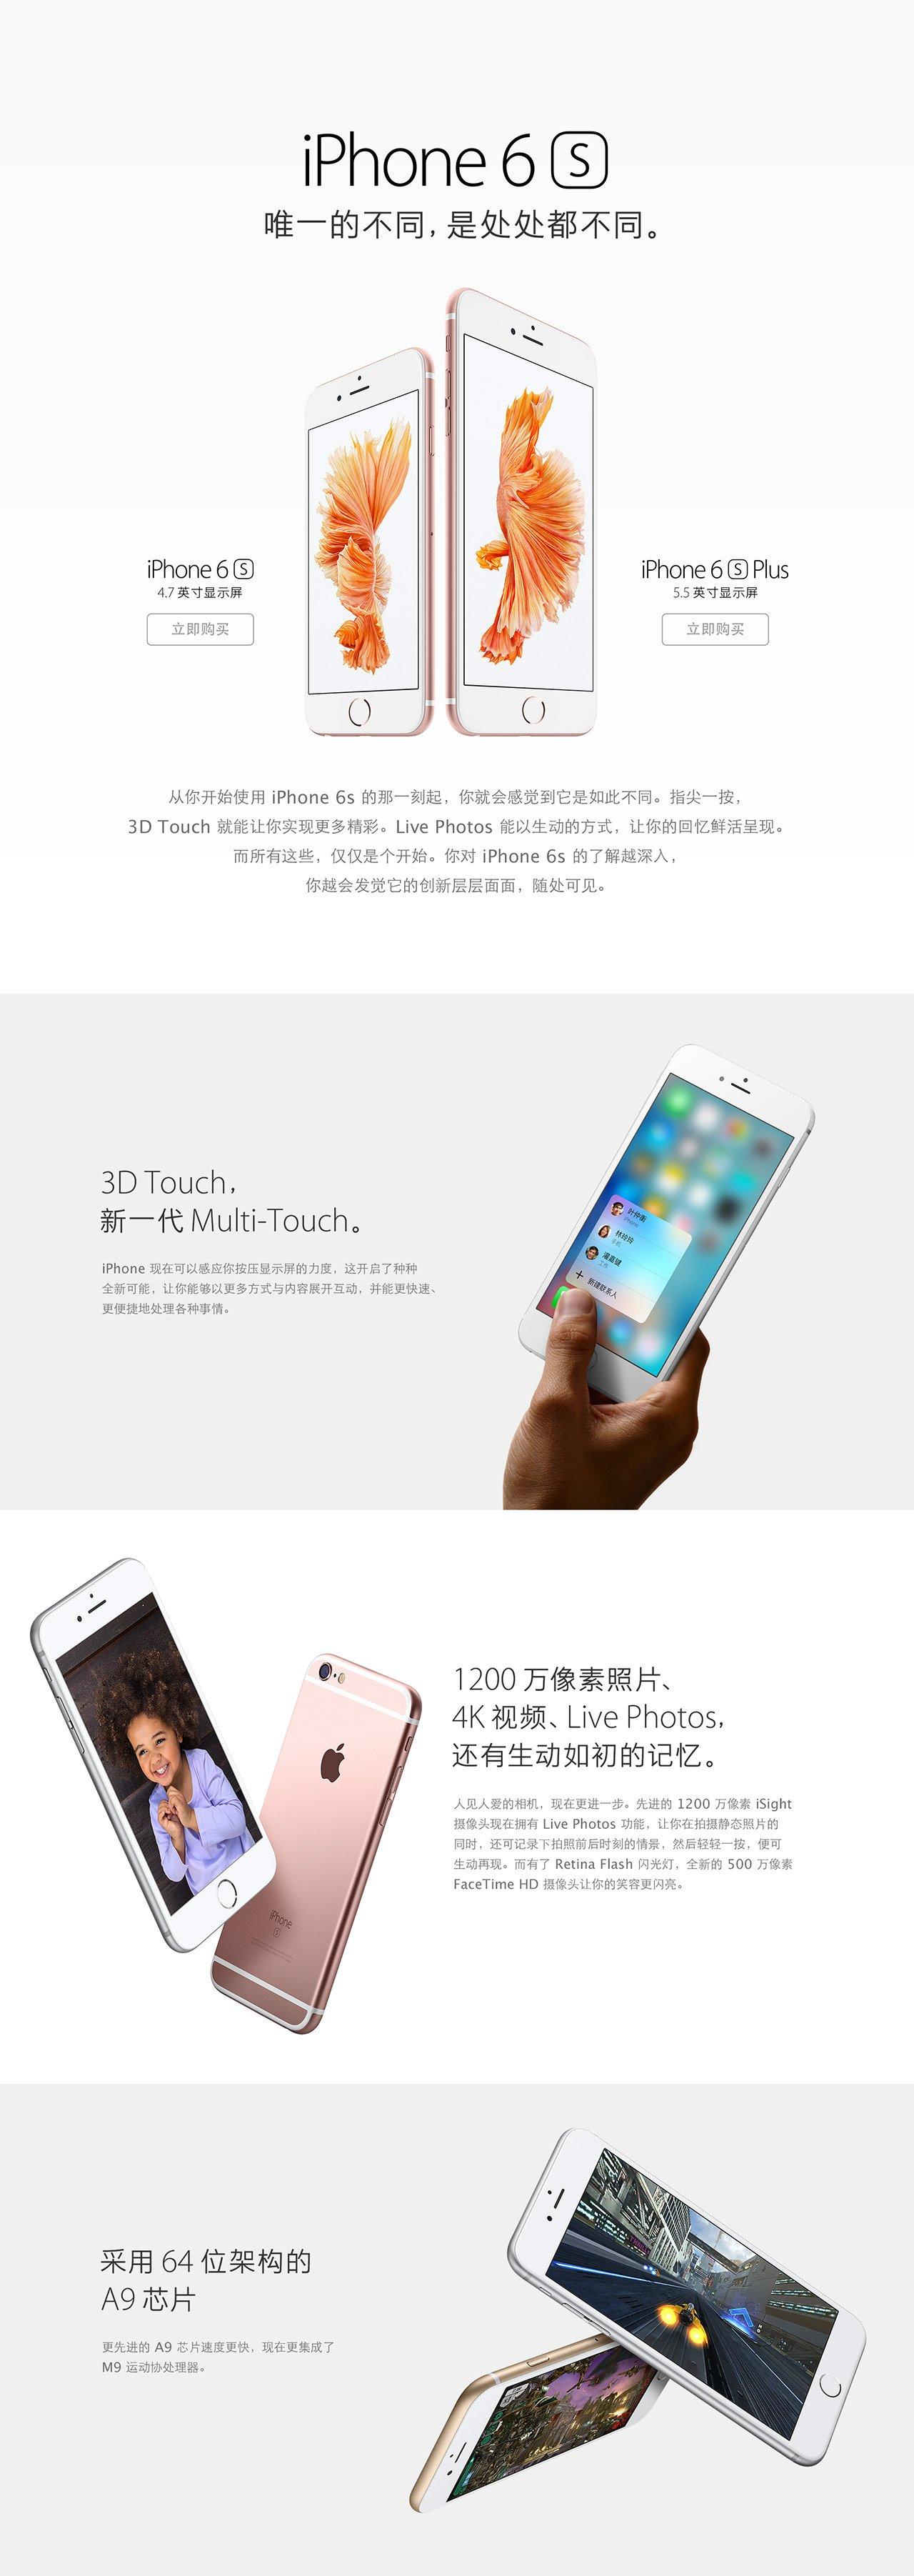 iPhone 6s—亚马逊